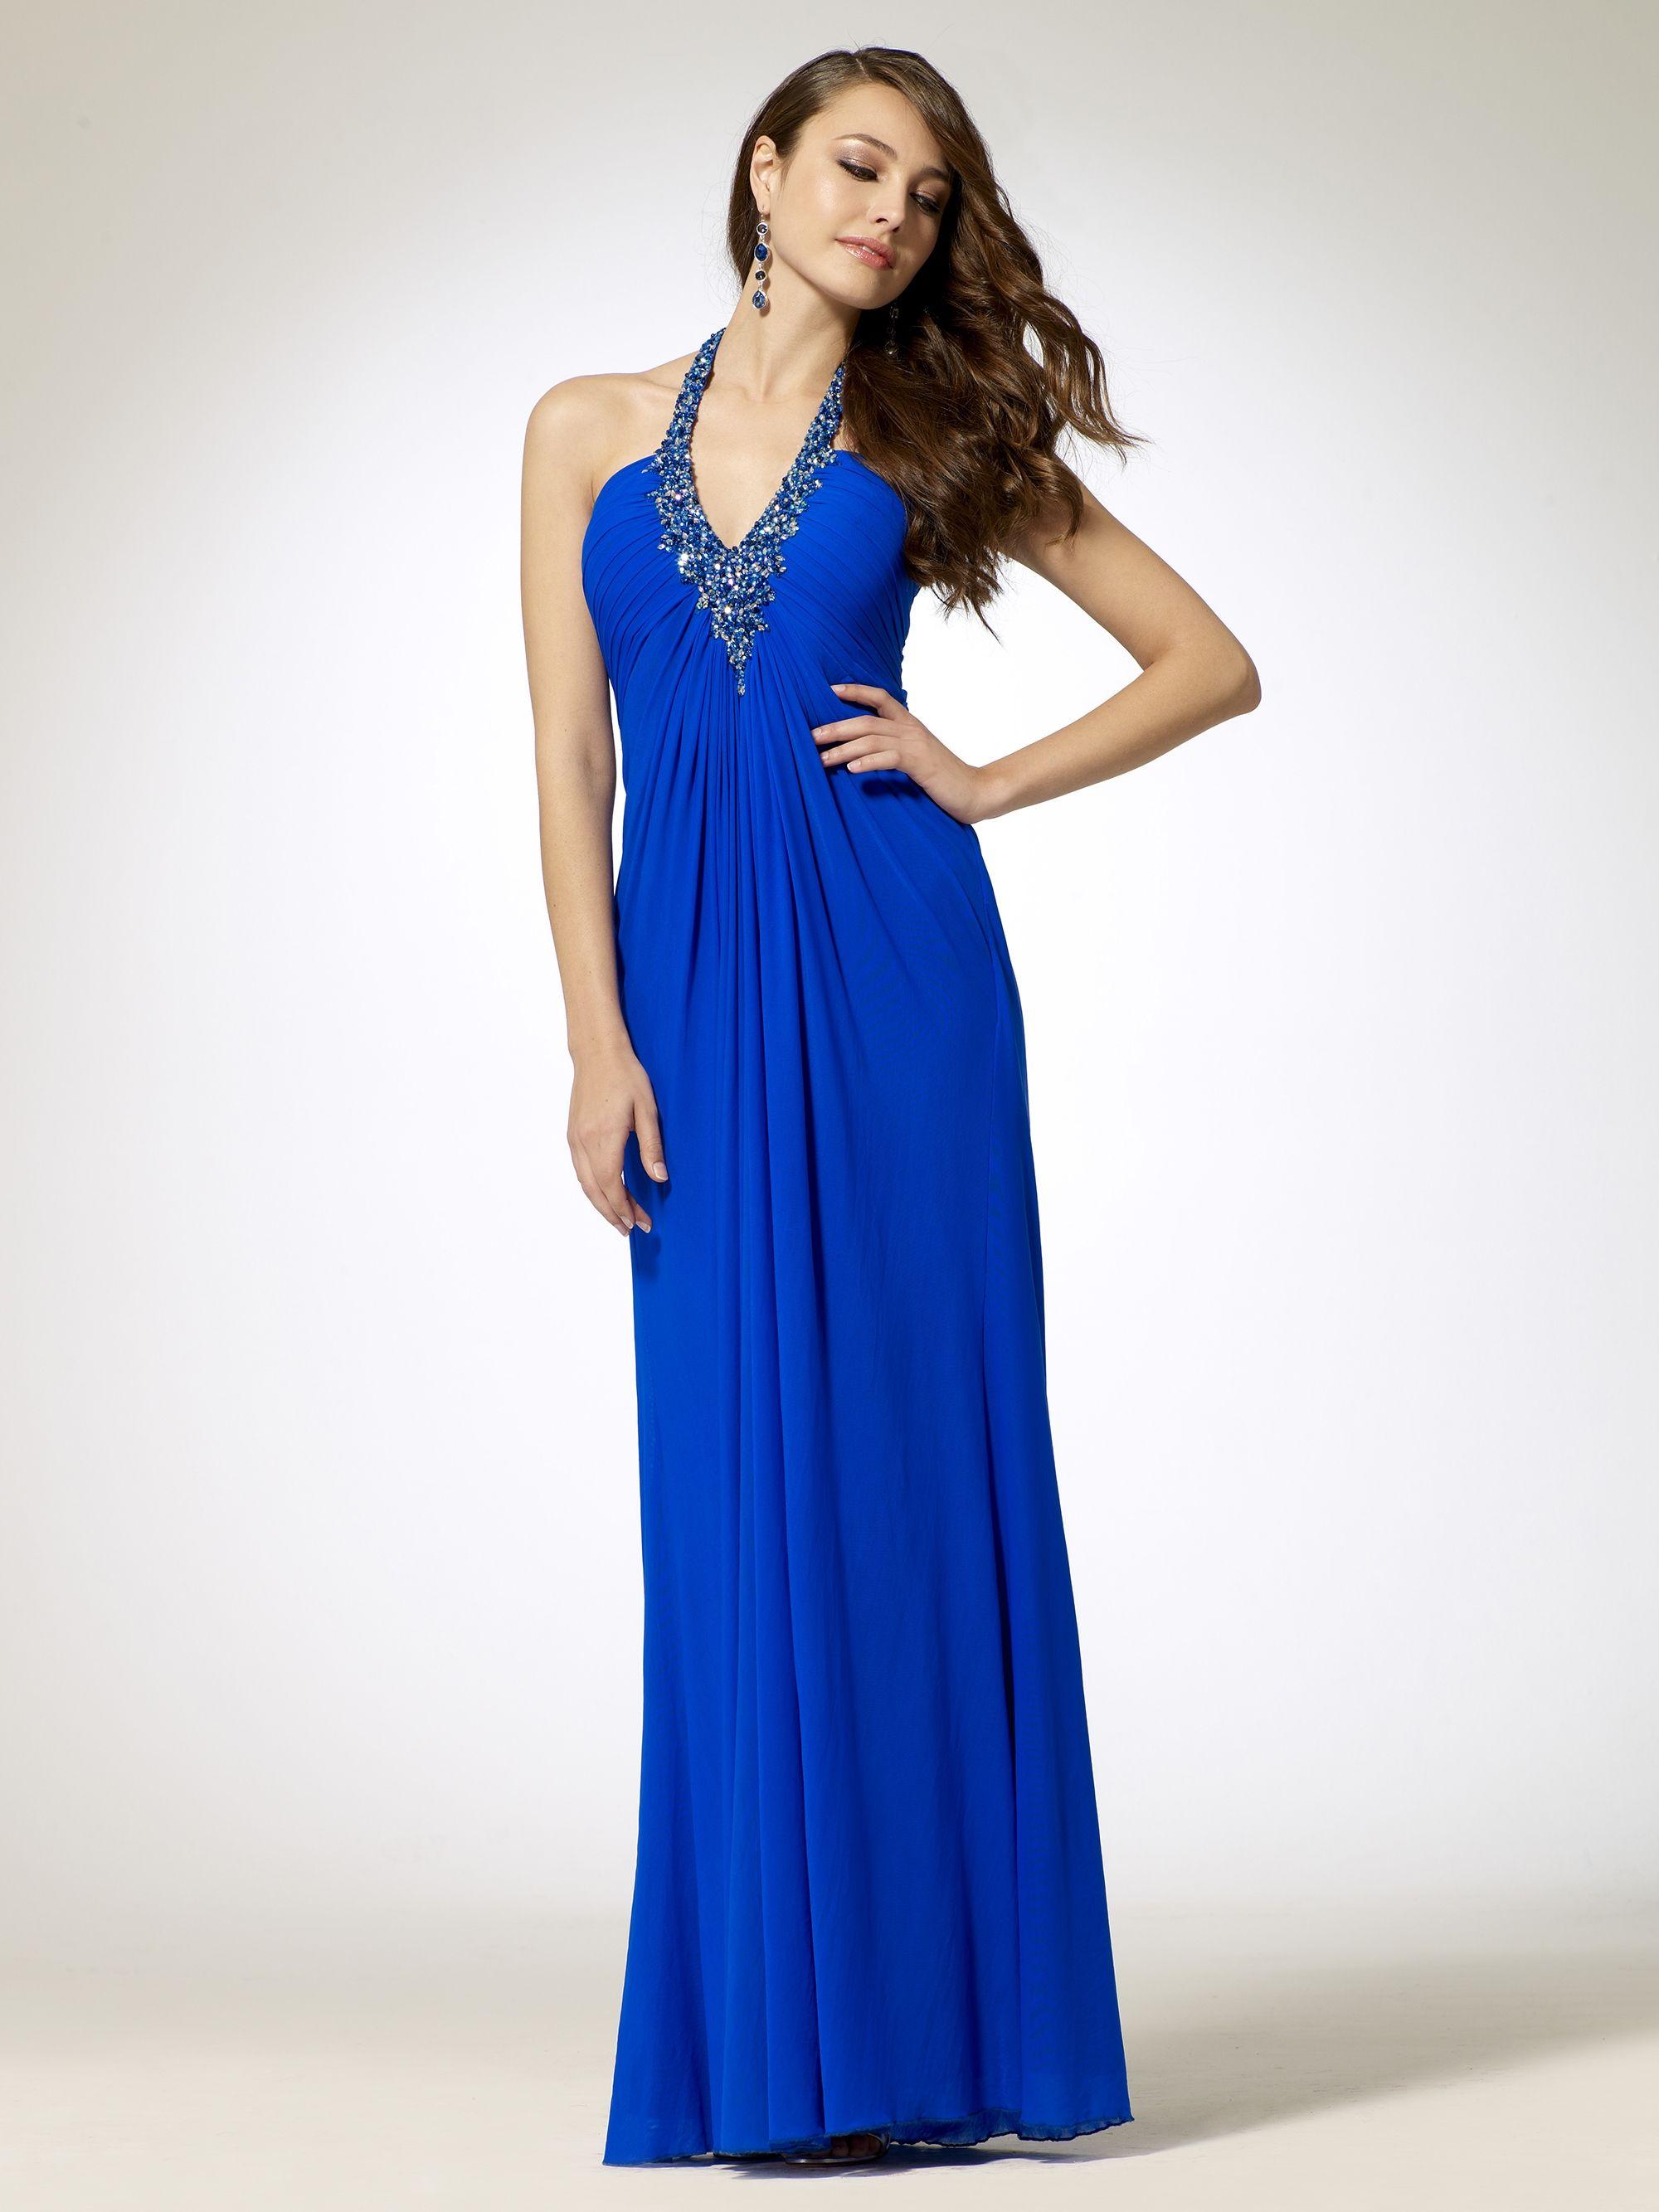 Beaded necklace halter gown evening dresses pinterest halter